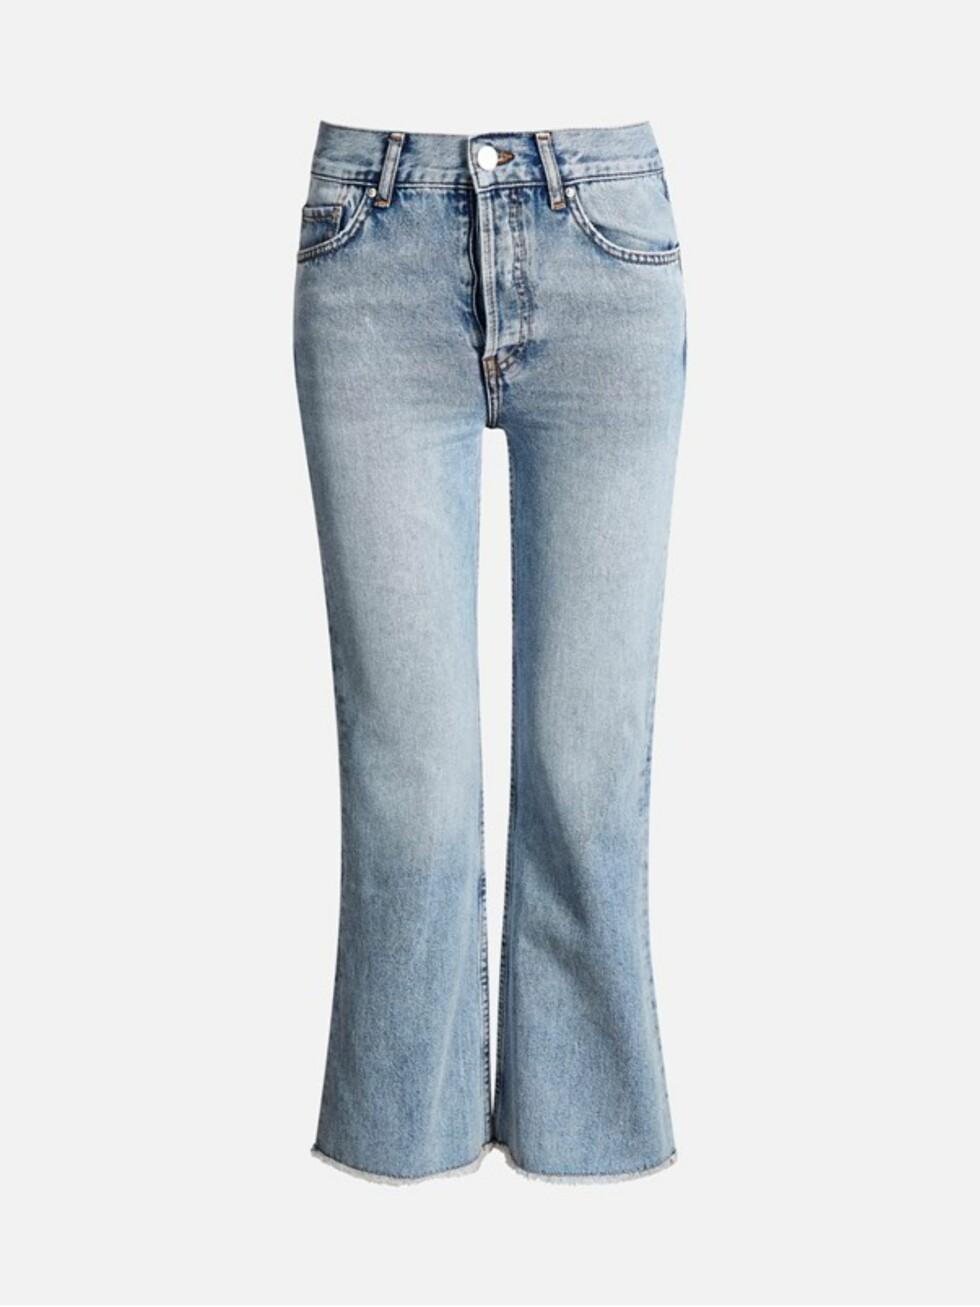 Jeans fra Bik Bok | kr 599 | https://bikbok.com/no/trousers/jeans/flare-cropped-jeans/7203342_F510